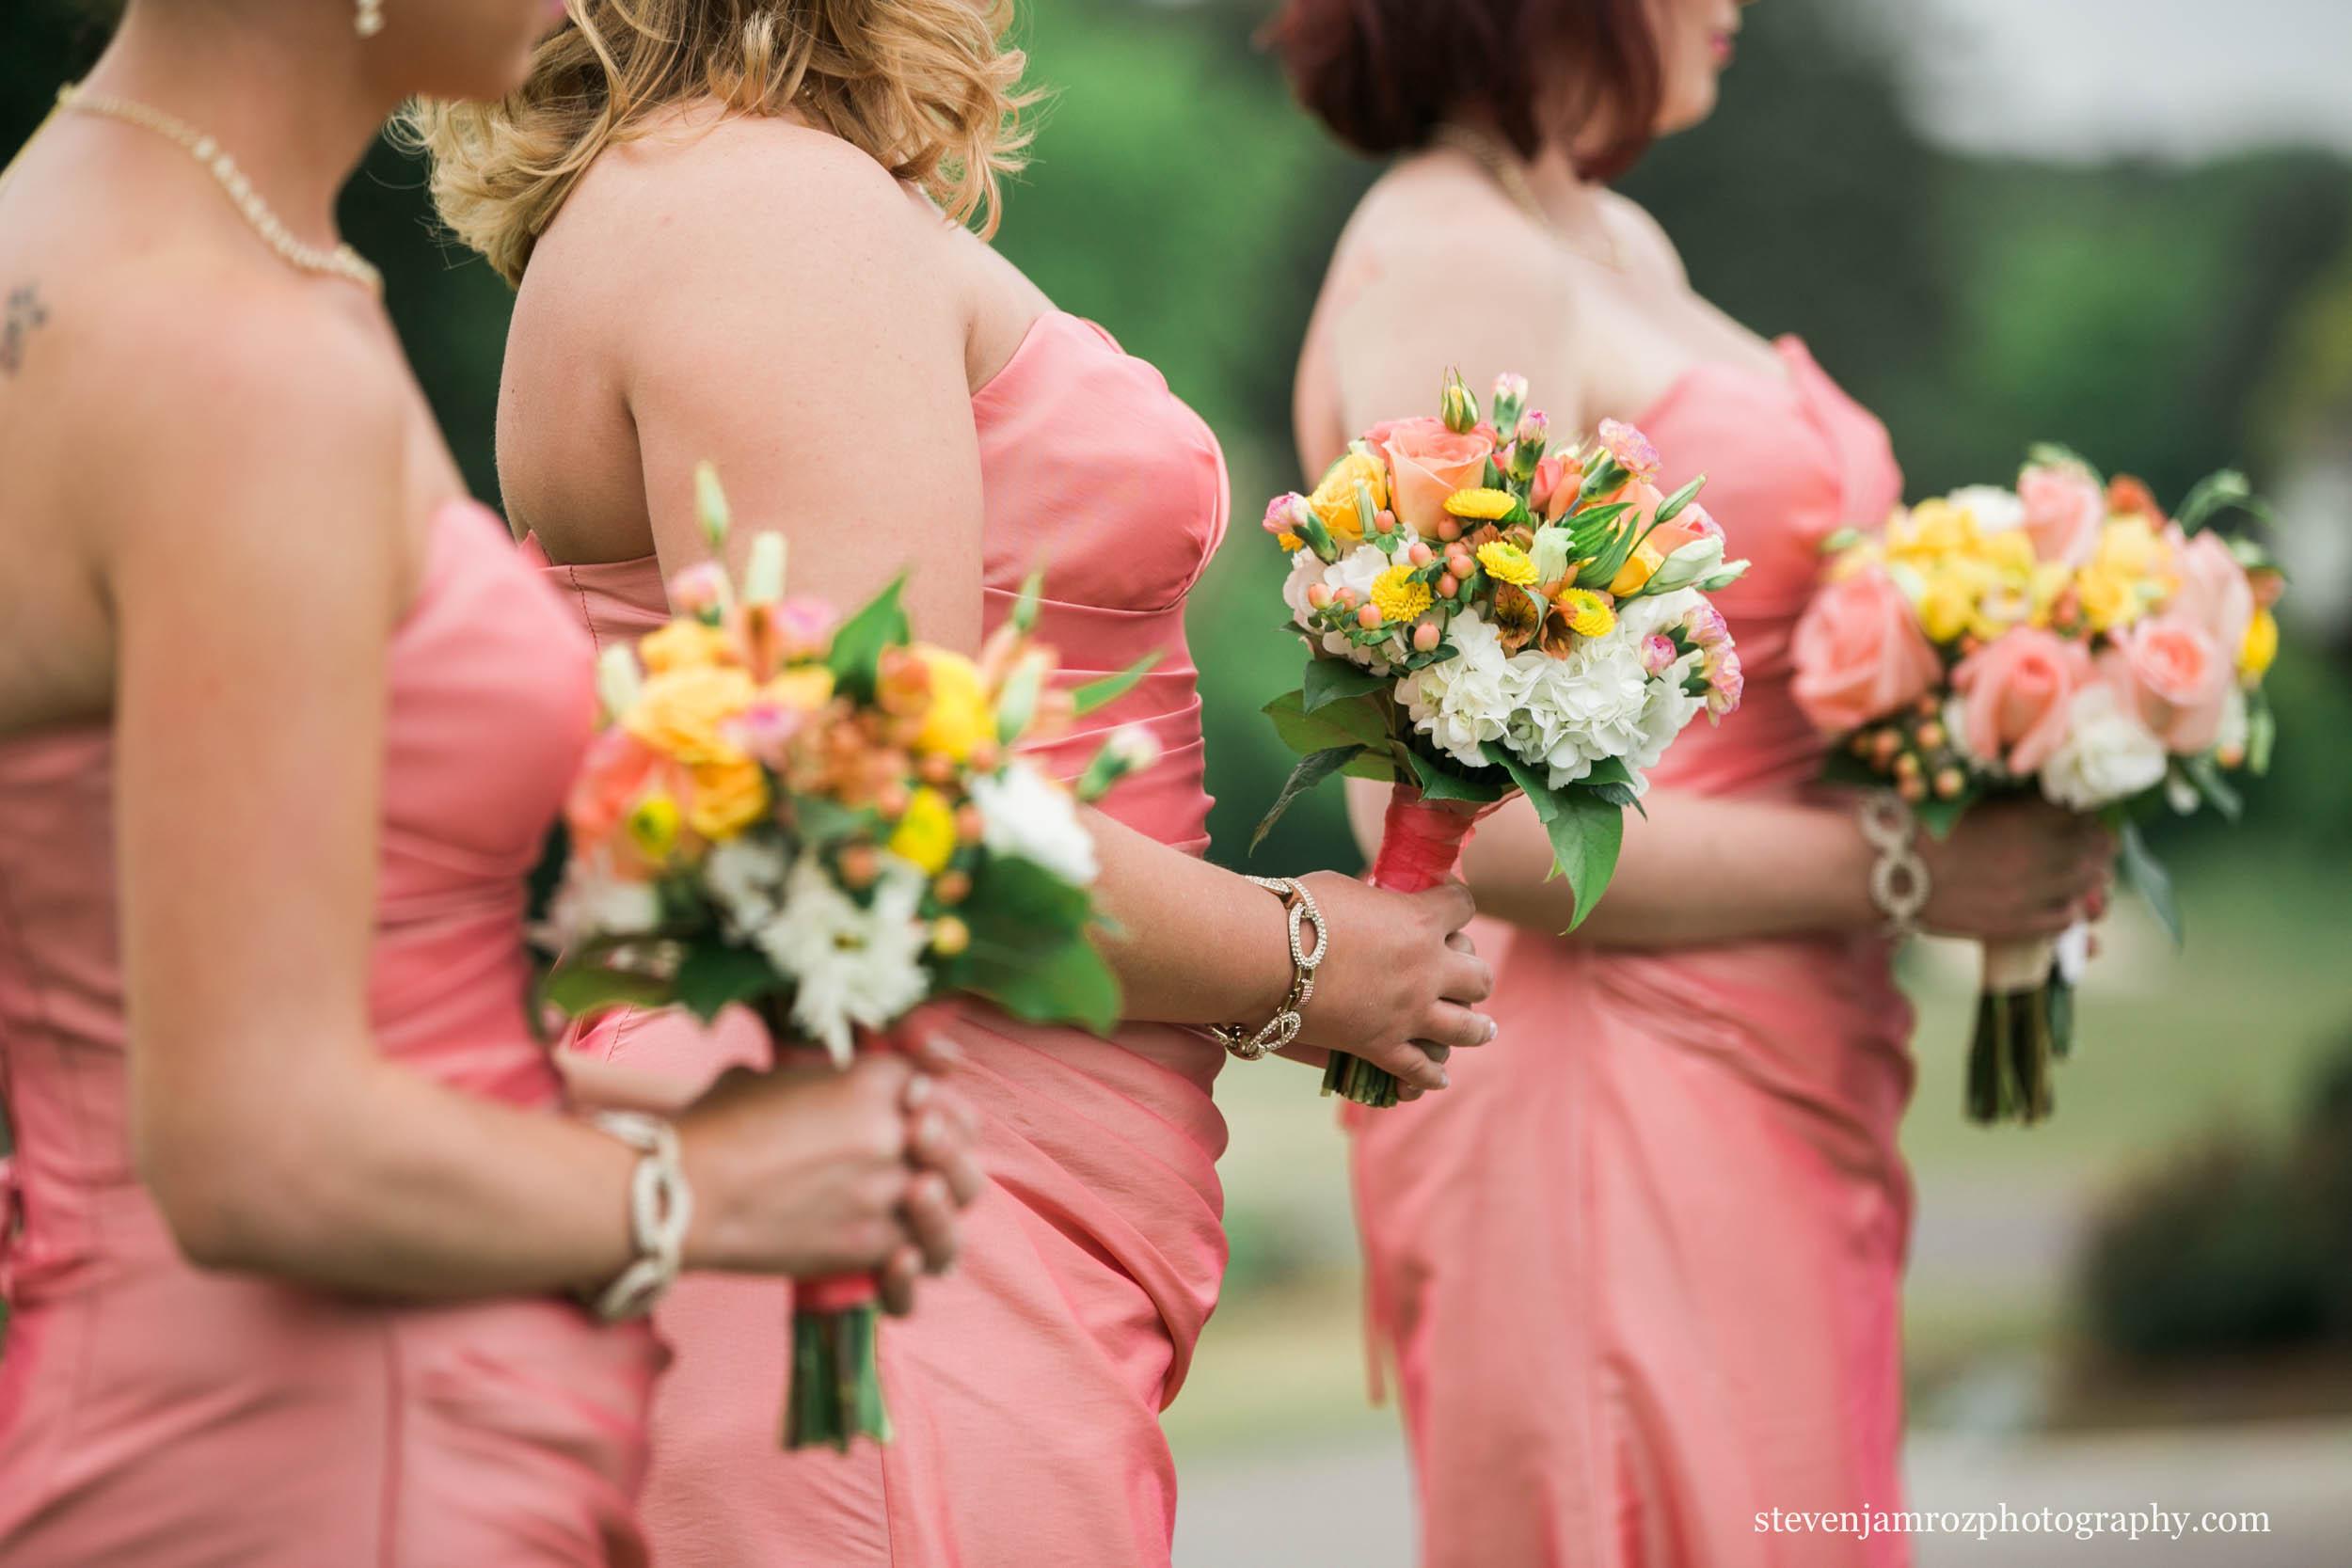 raleigh-country-club-nc-wedding-steven-jamroz-photography-0616.jpg